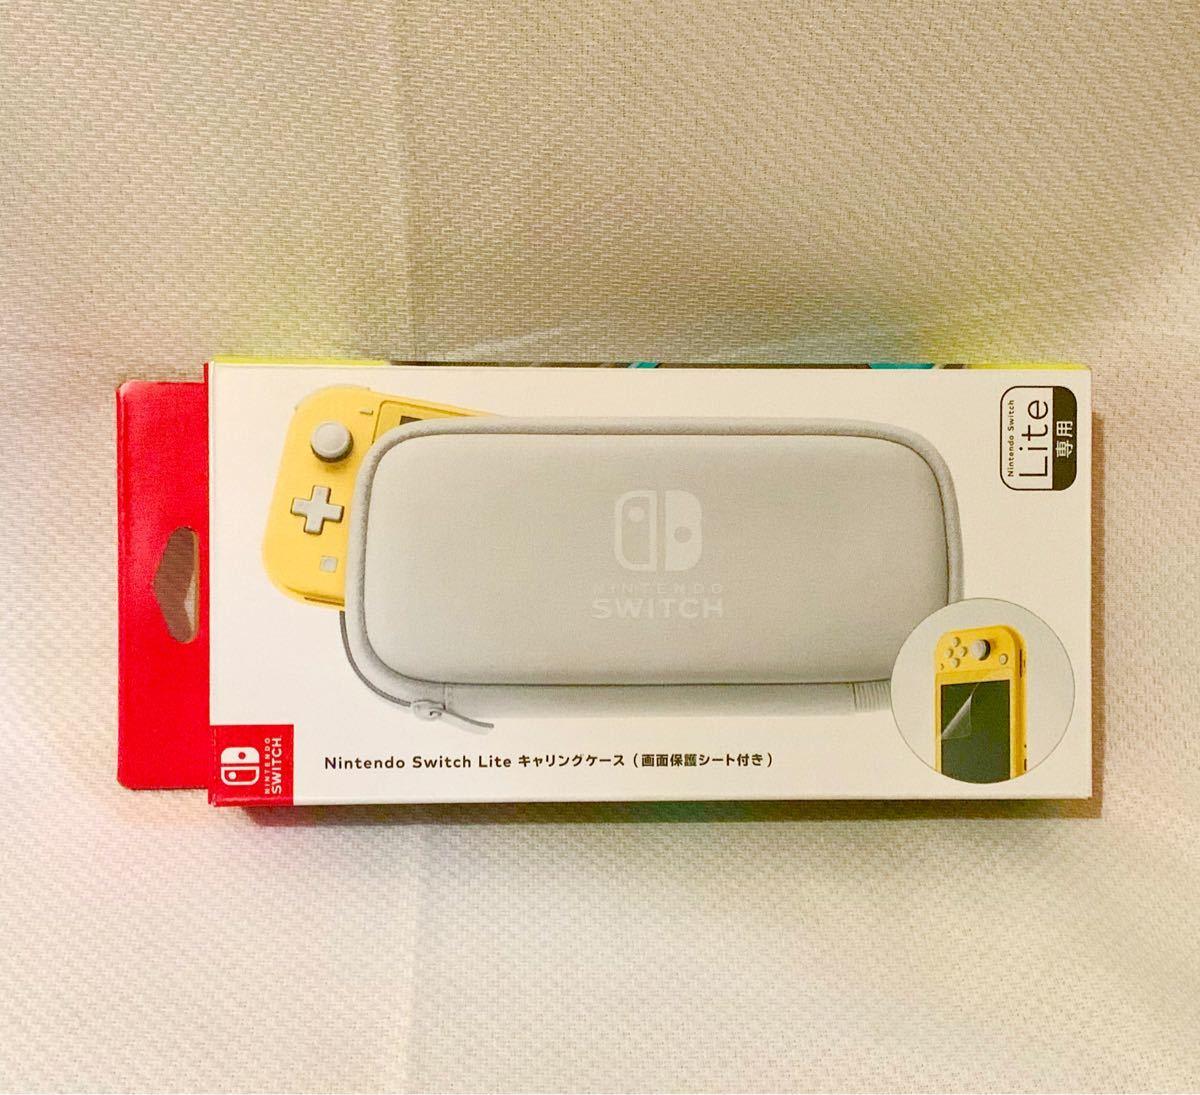 Nintendo Switch Liteキャリングケース(画面保護シート付き)